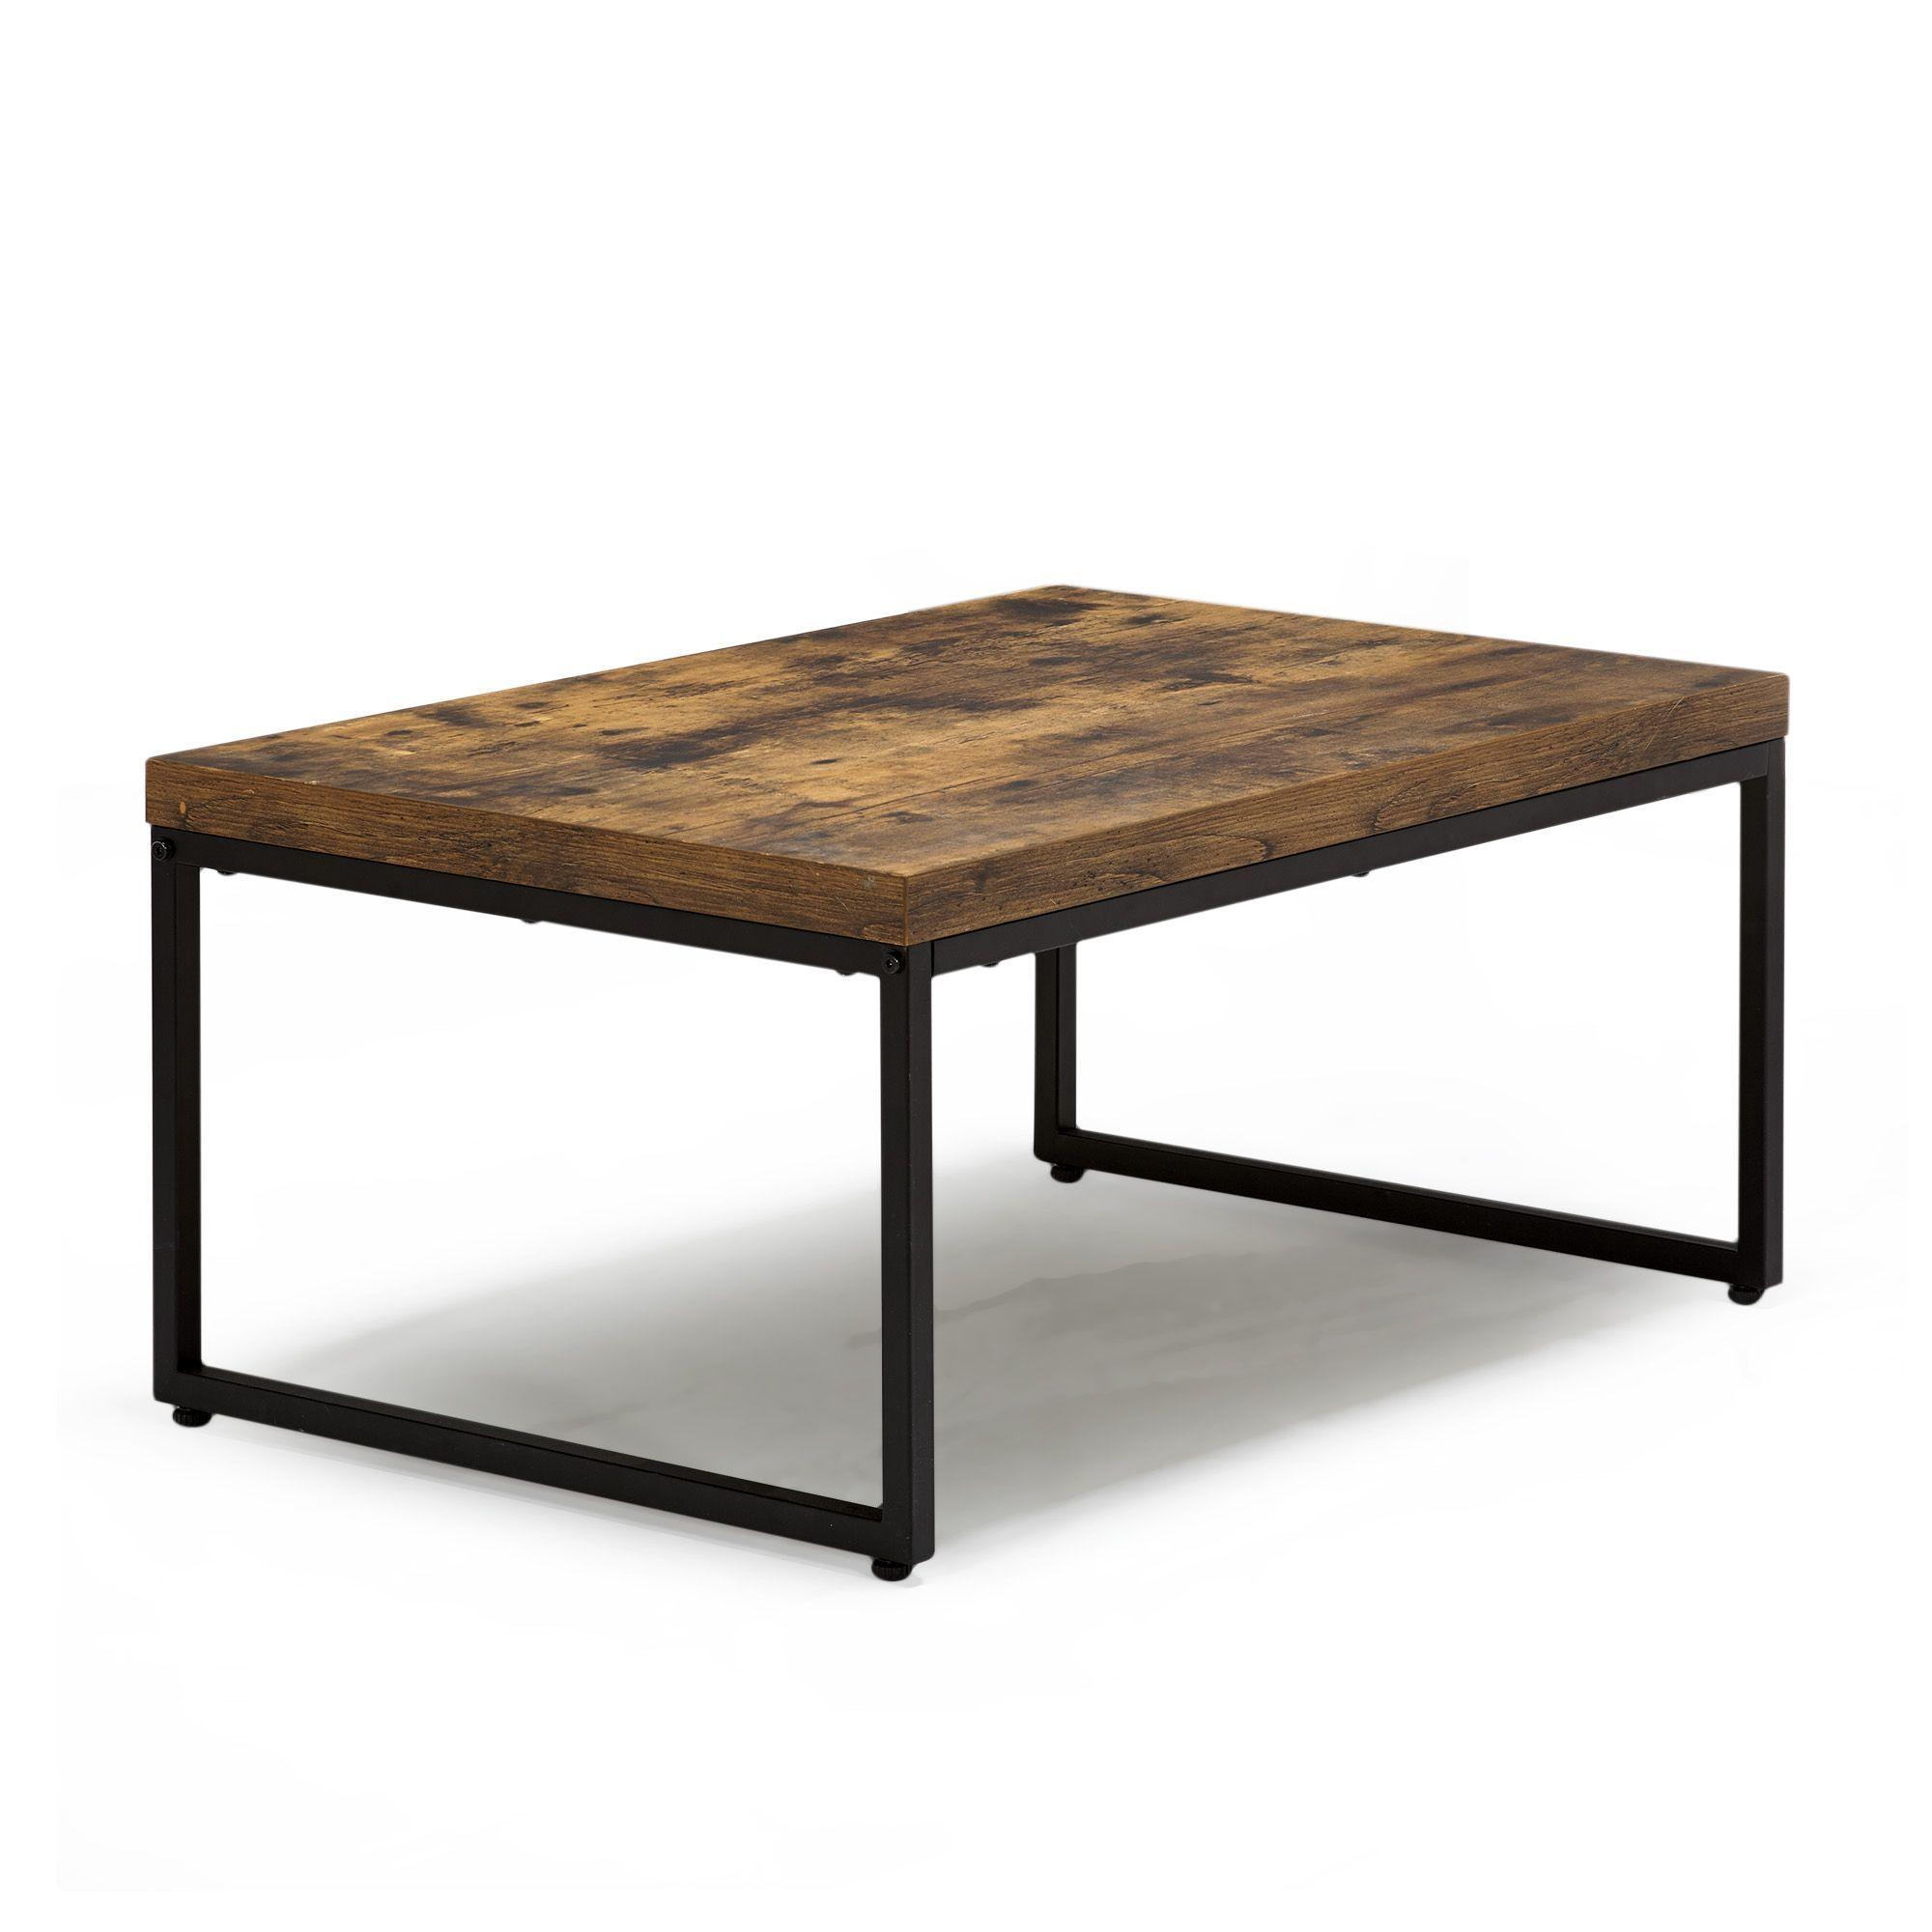 7a86ded32cd784110eeda1a6770f447c Incroyable De Table Basse Anglais Conception